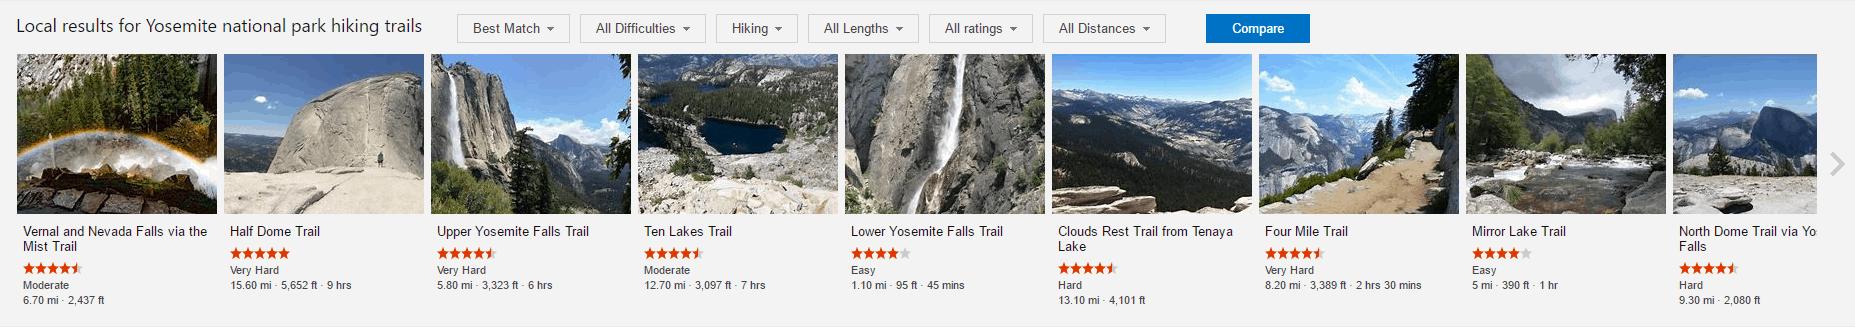 Bing Hiking